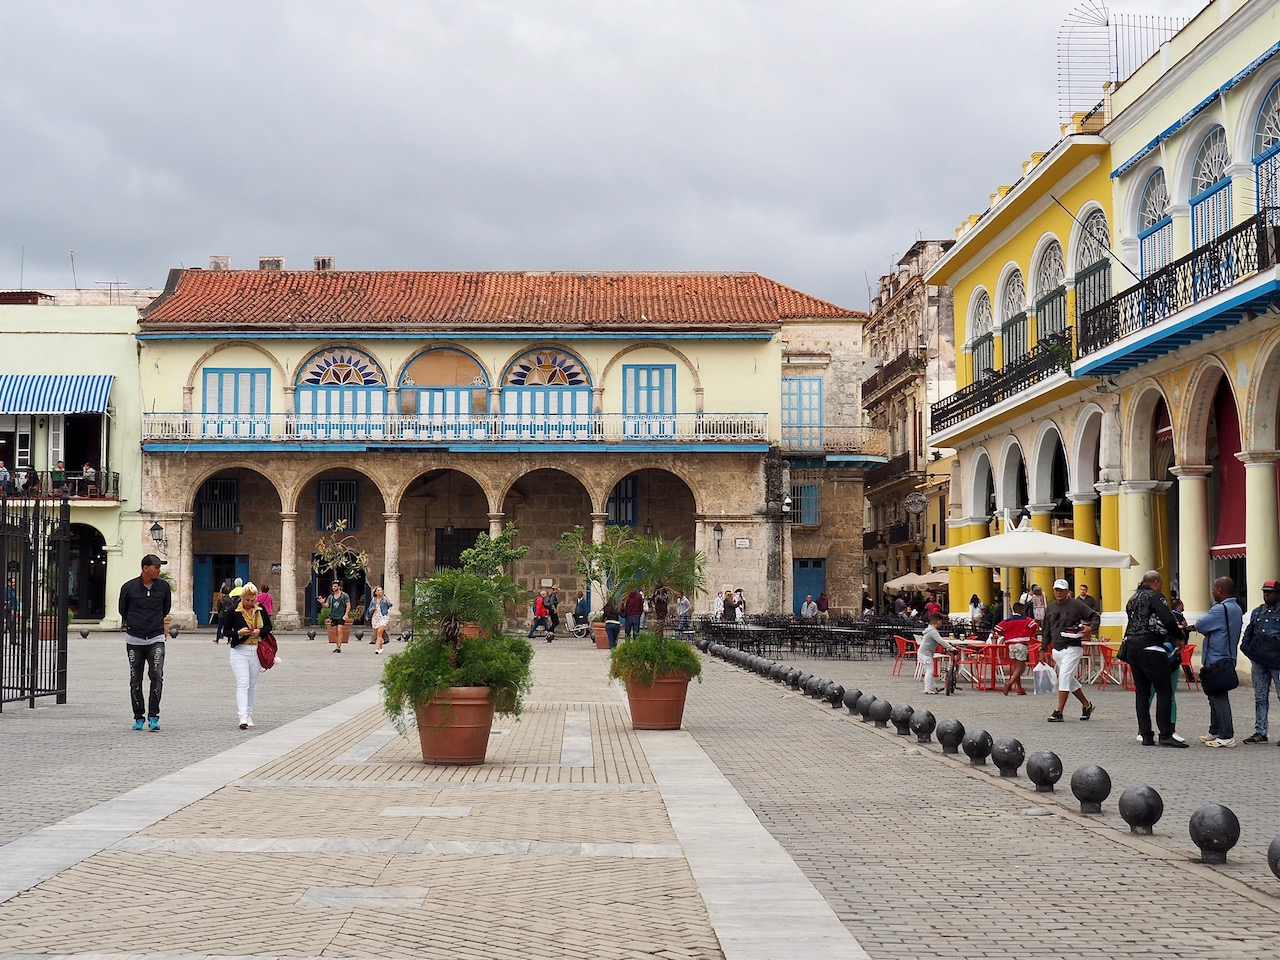 3 jours à la Havane - Piaza Vieja